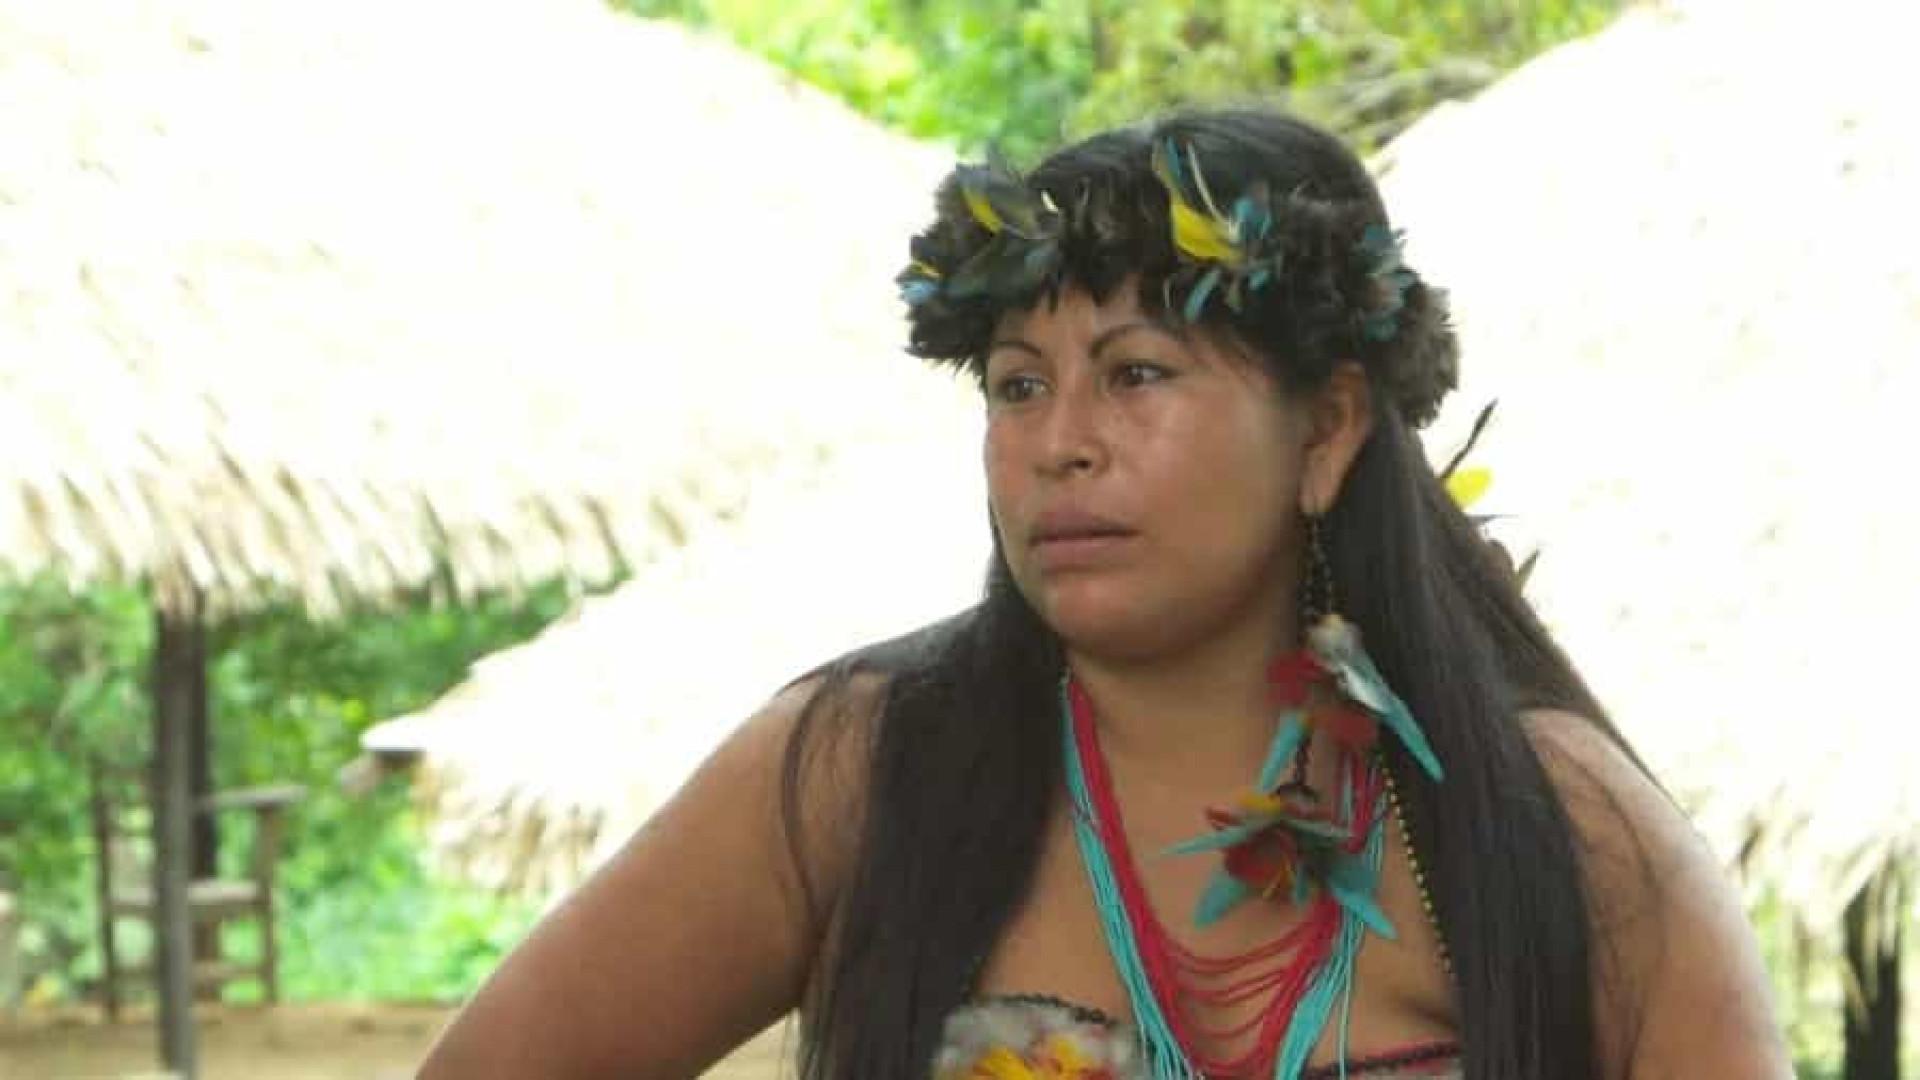 Após denunciar mineração ilegal, líder indígena tem casa invadida